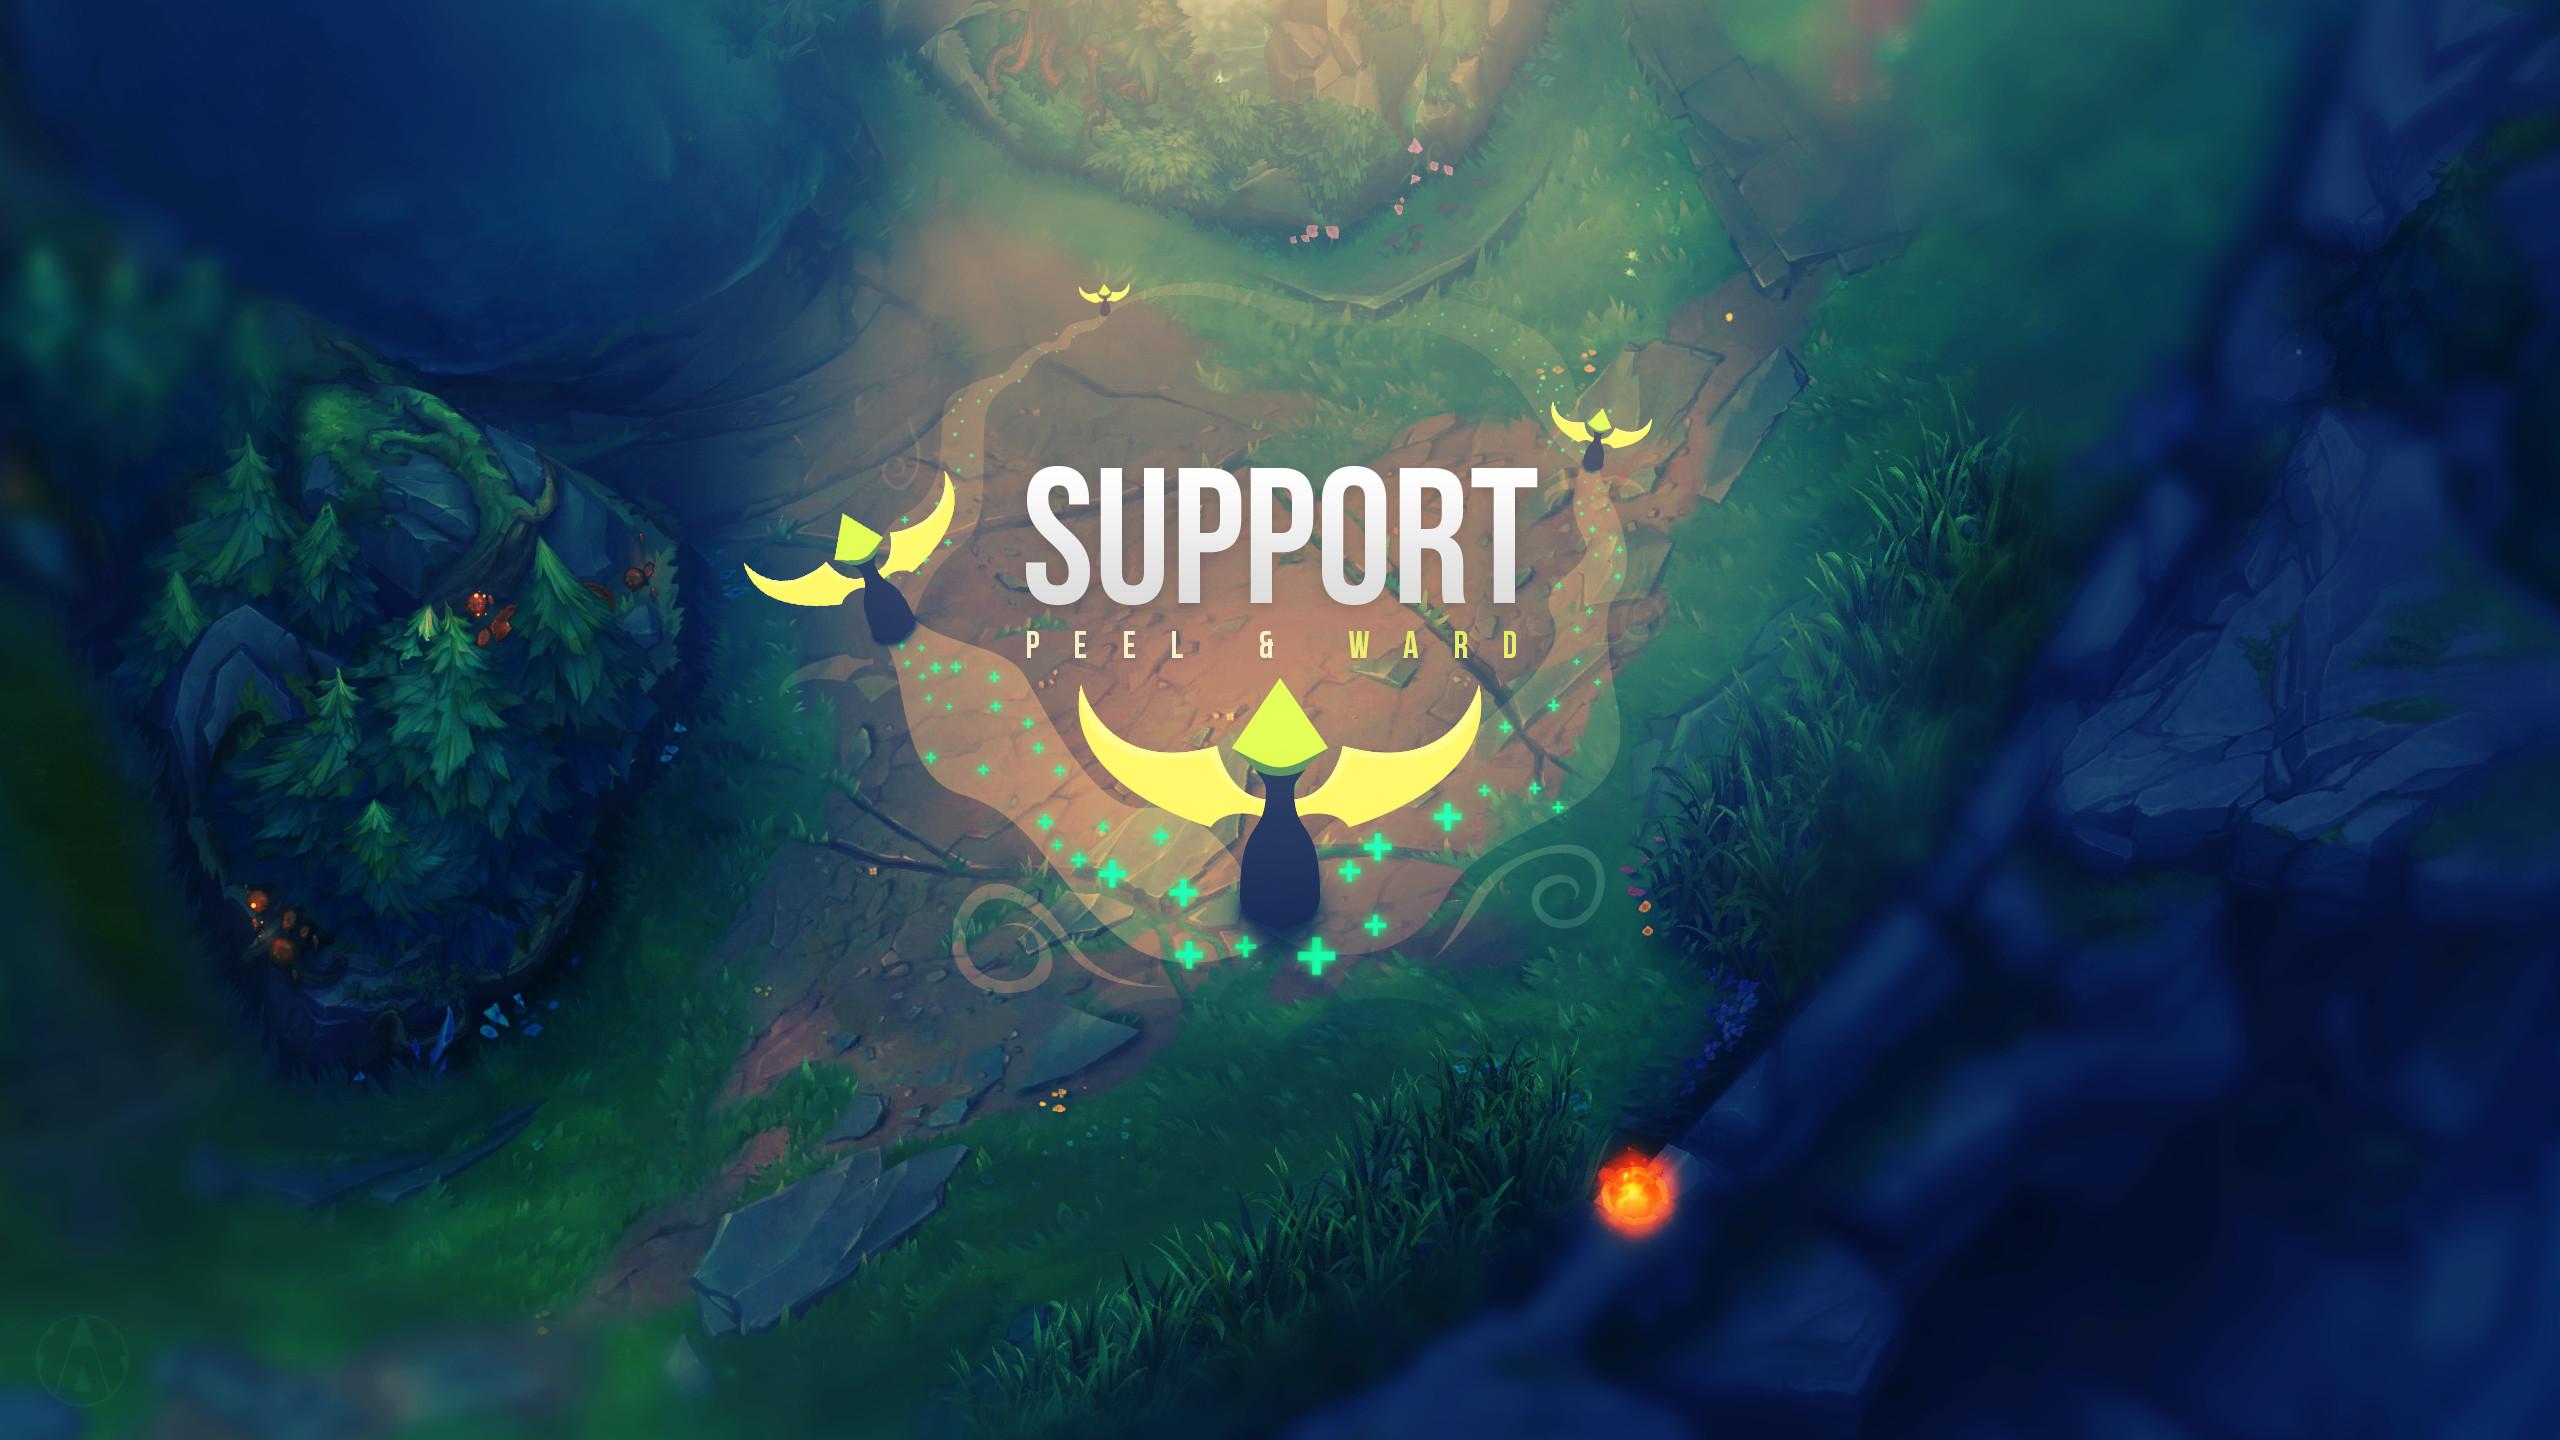 2560x1440 Support Wallpaper + album - League of Legends by Aynoe on DeviantArt